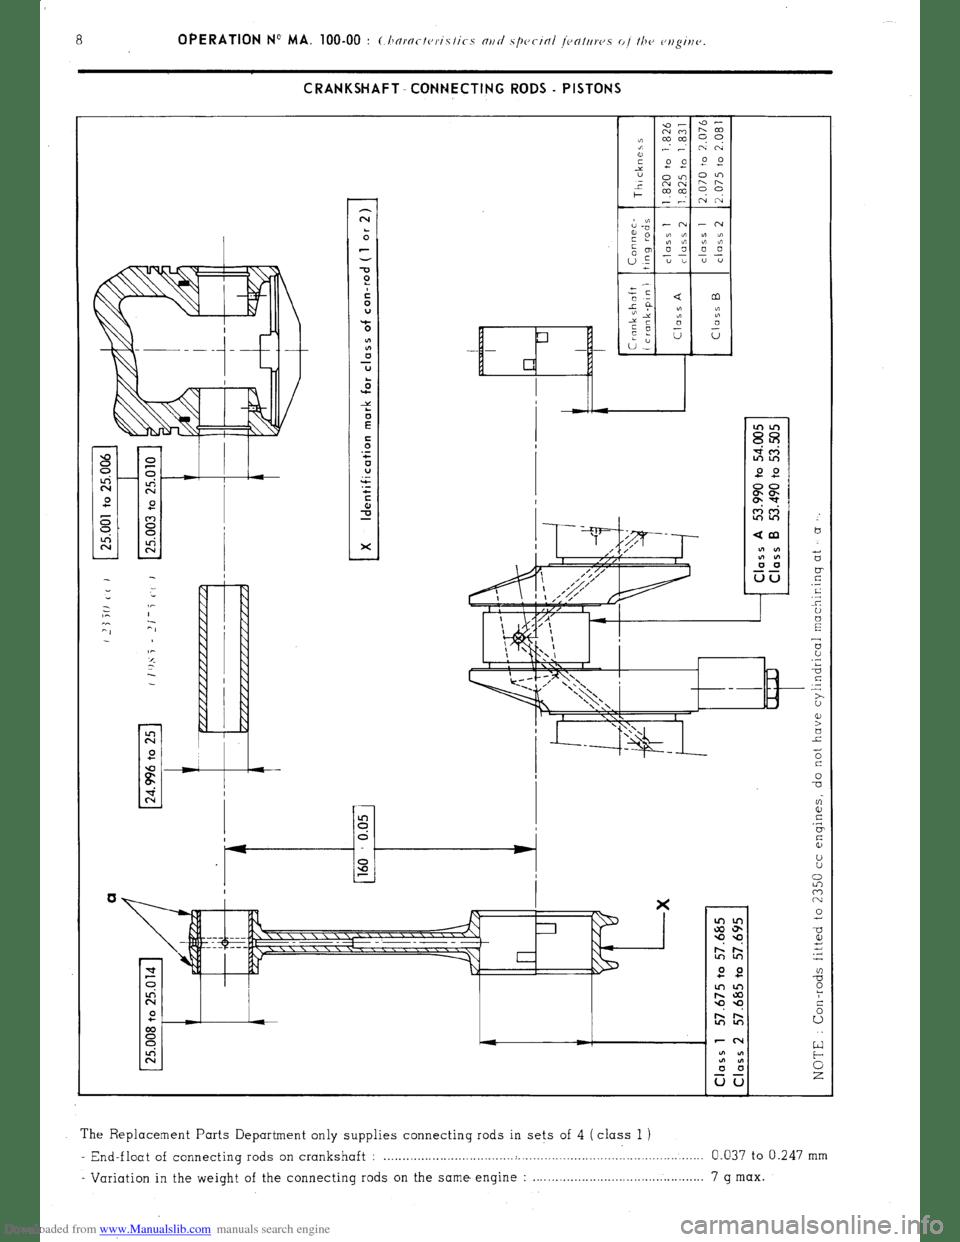 Citroen CX 1977 1.G Repair Manual (394 Pages)